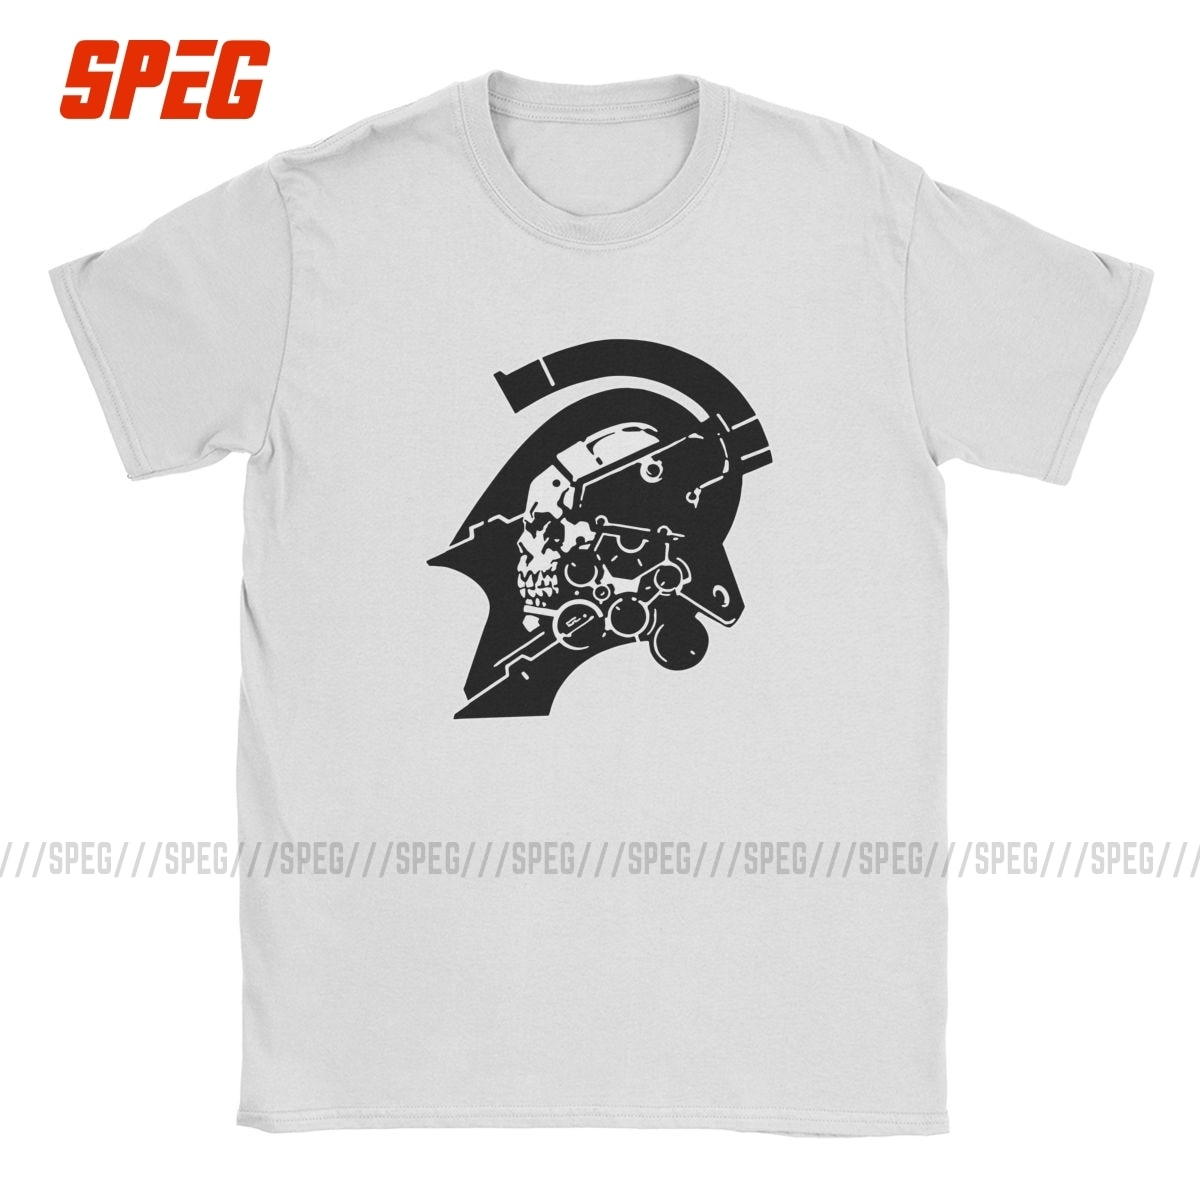 Metal Gear Kojima Mens T-Shirt Printed Crewneck T Shirts Short-Sleeved T-Shirts Cotton Tees Clothing Plus Size